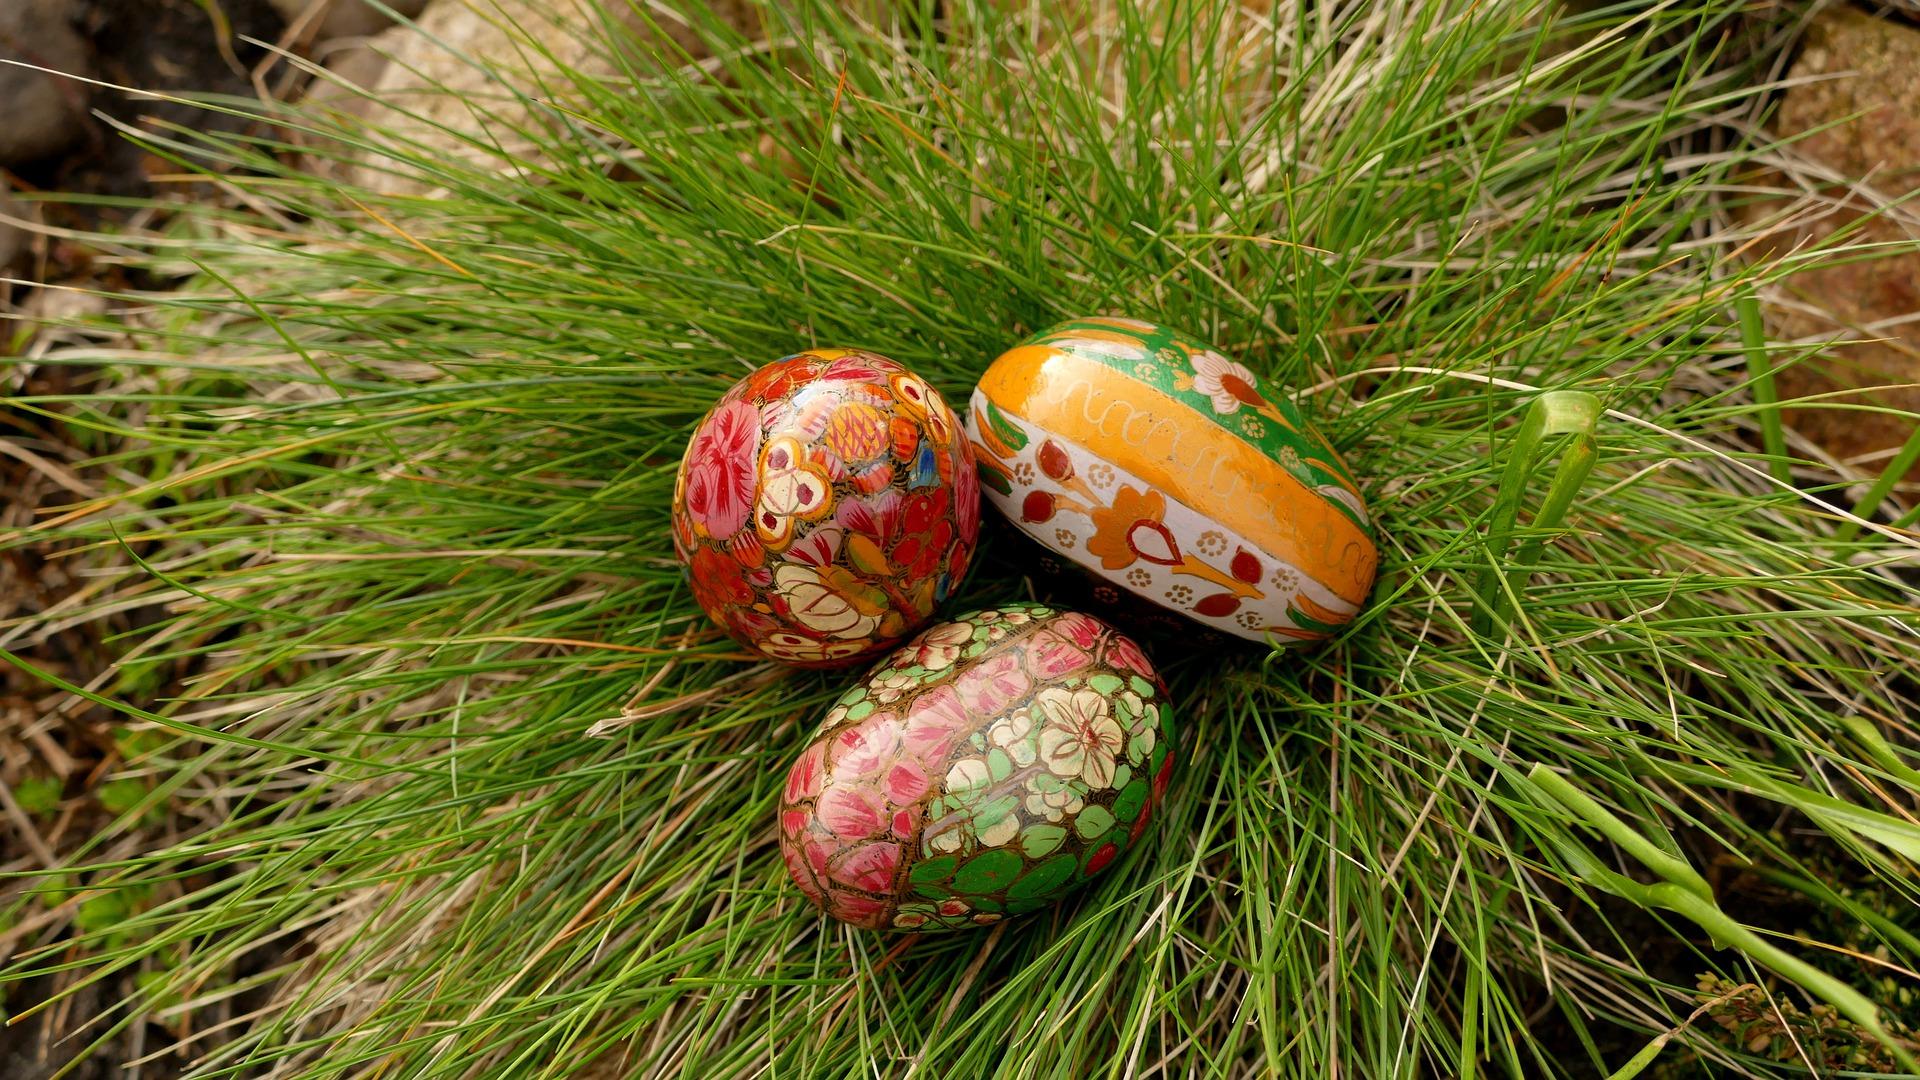 Bir Yeniden Dogus Umudu Paskalya Yumurtalari Ve Tarihi Yemek